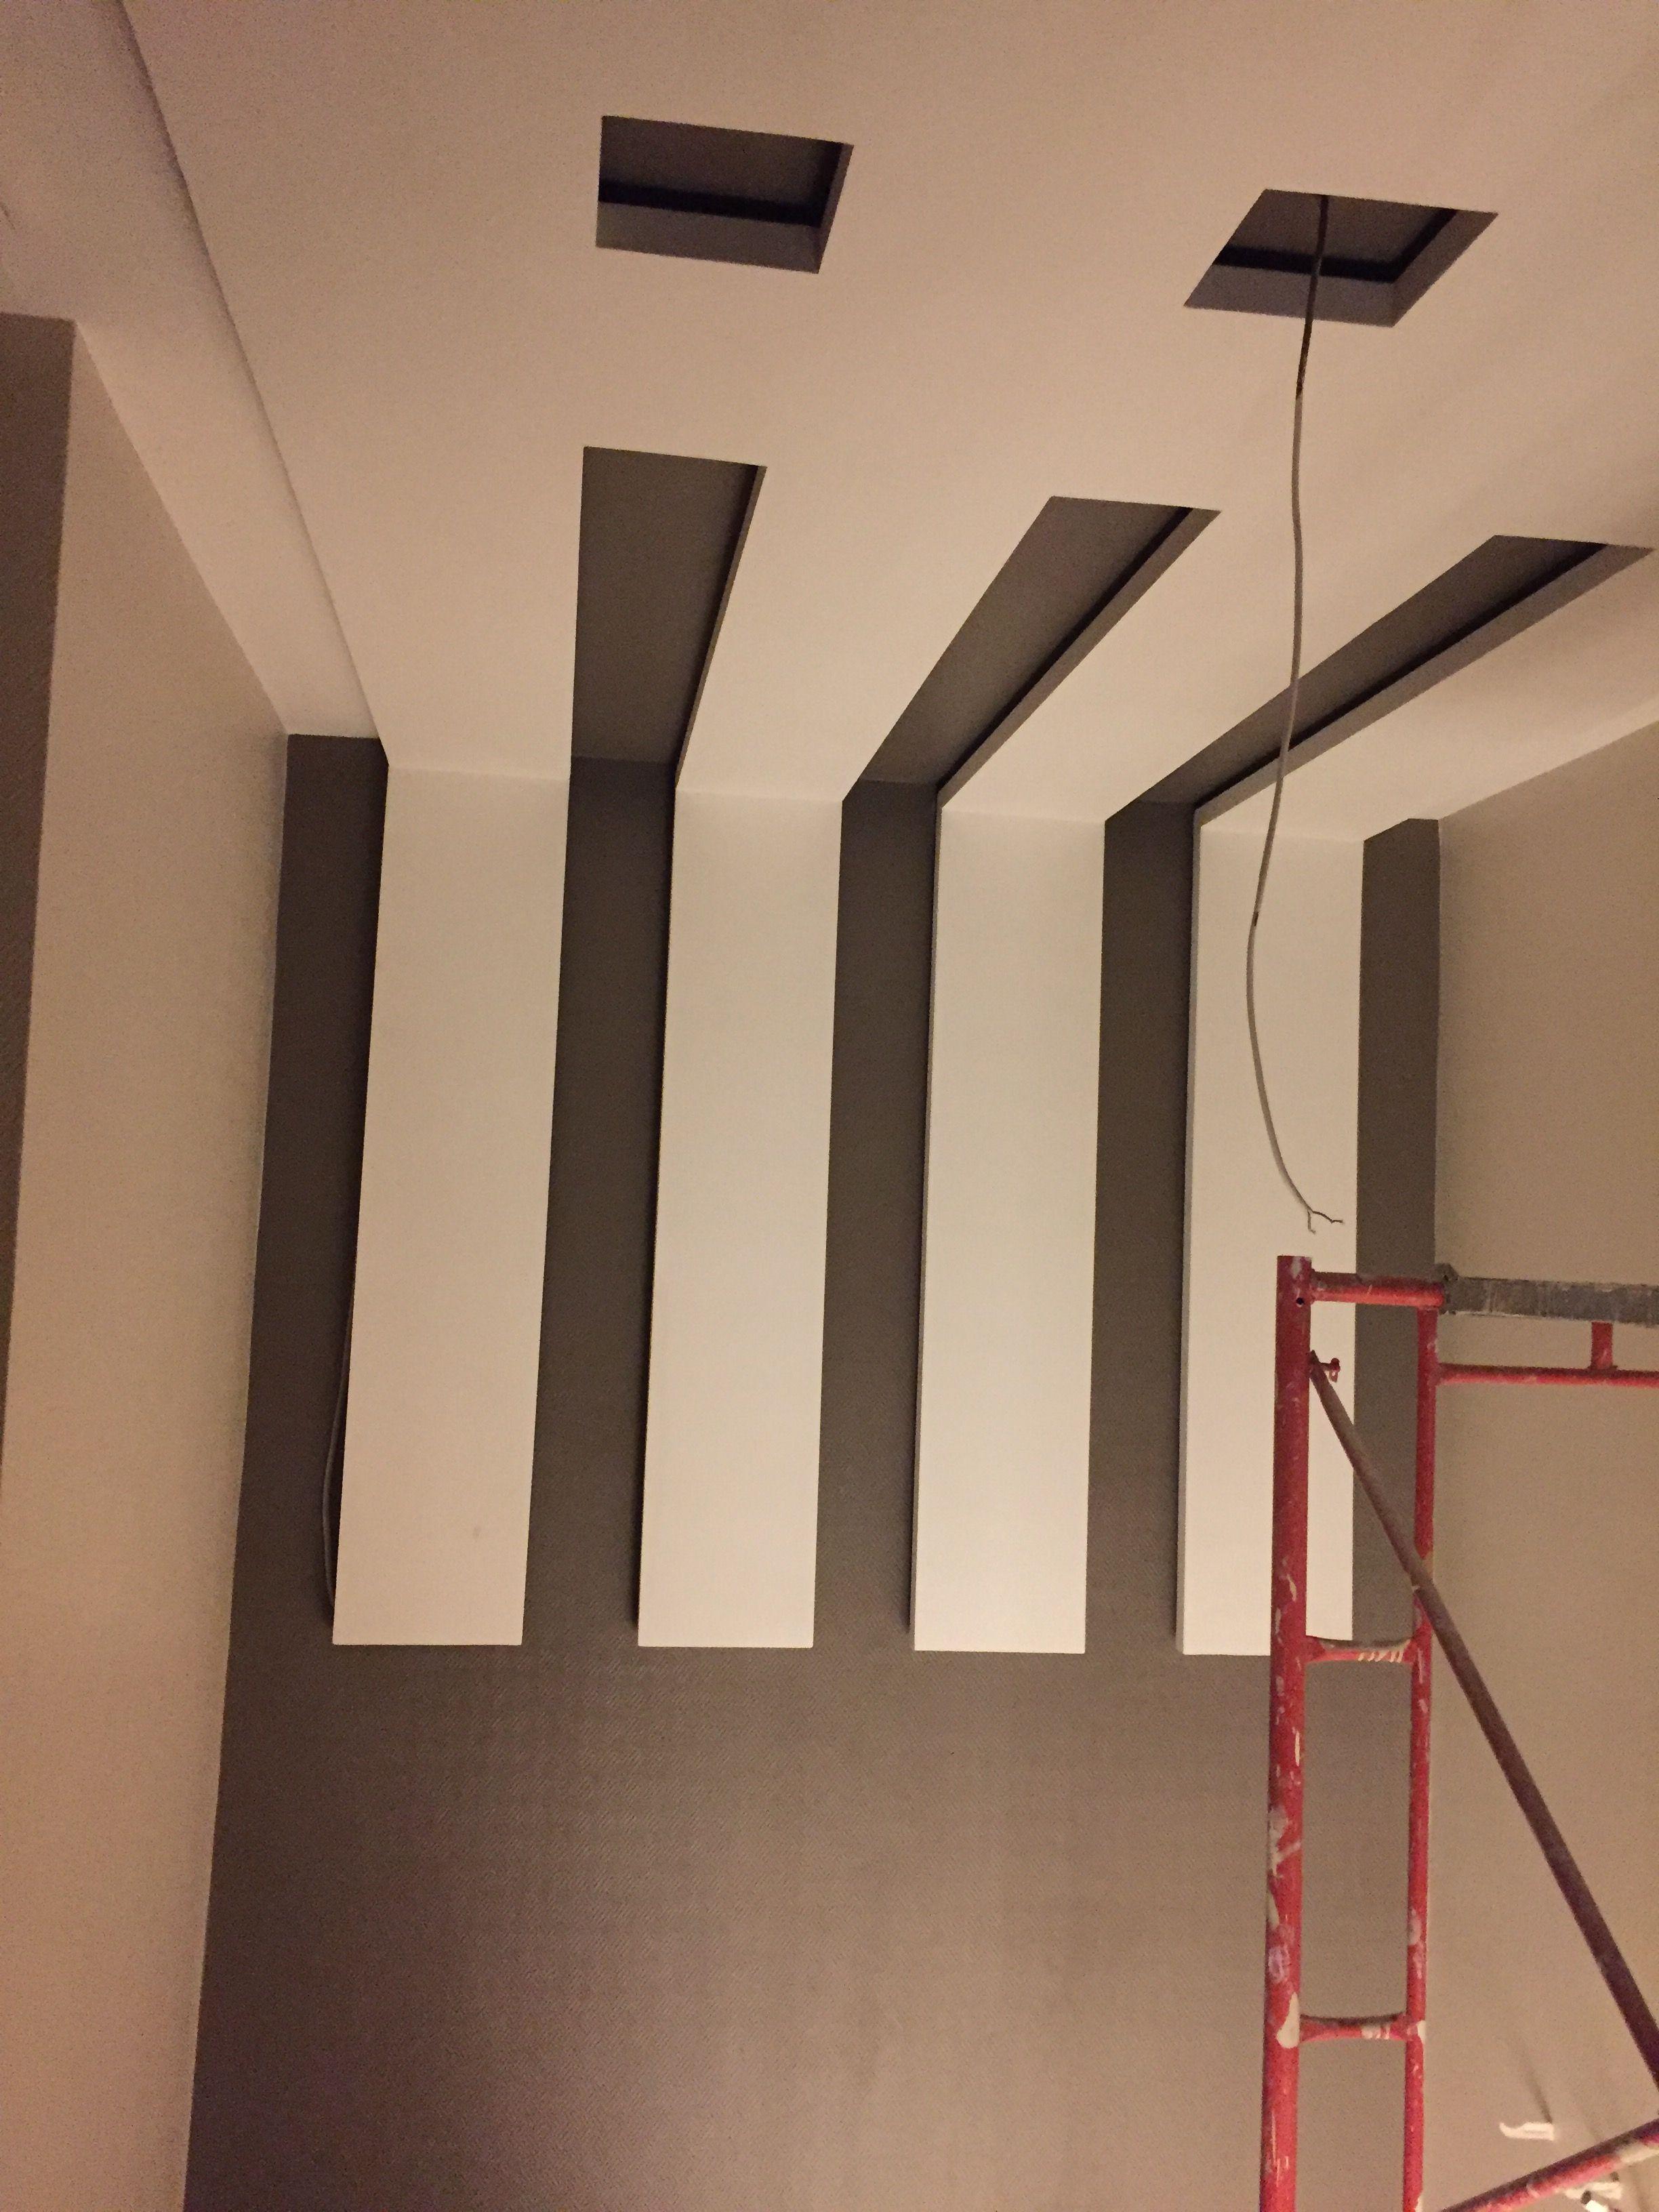 Master bedroom gypsum ceiling  False ceiling FalseCeilingLivingRoomMasterBedrooms  False Ceiling